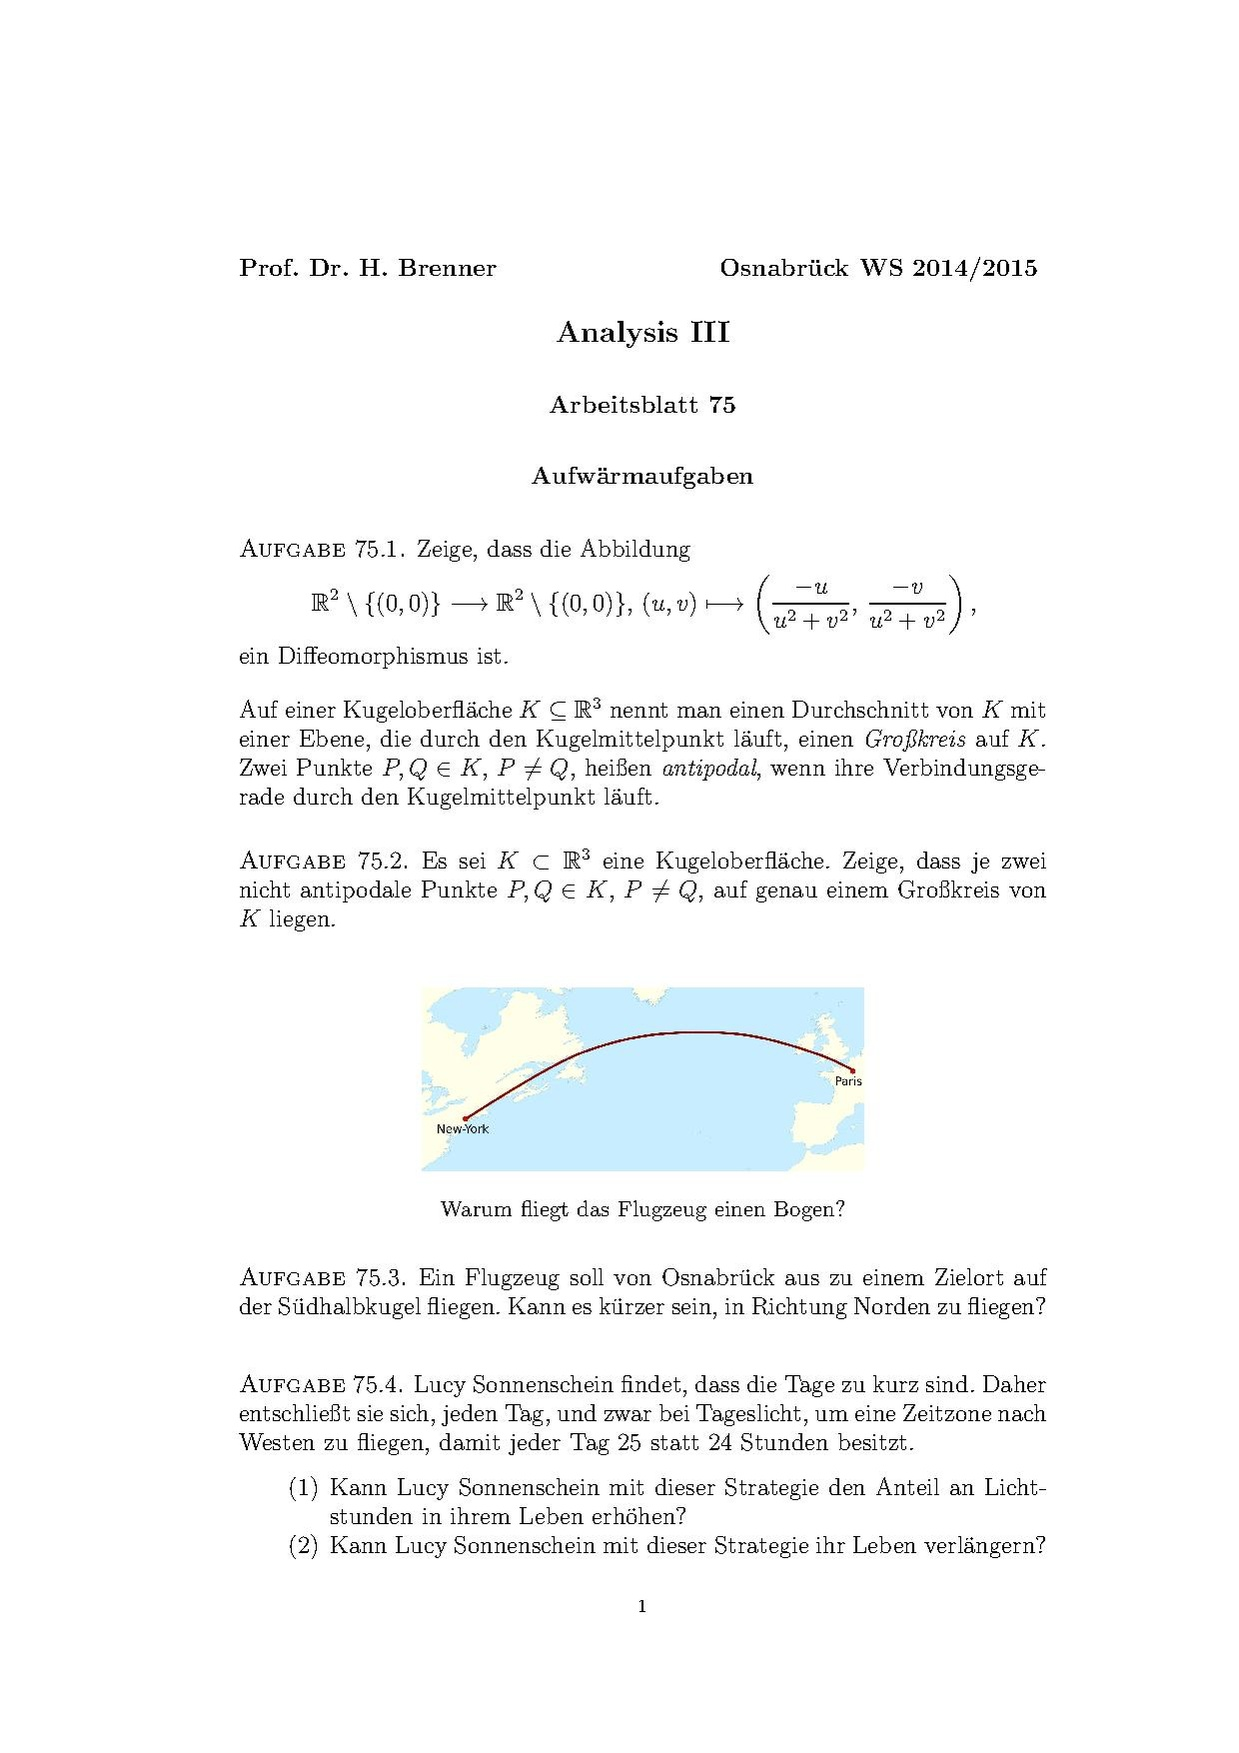 File:Analysis (Osnabrück 2013-2015)Arbeitsblatt75.pdf - Wikimedia ...